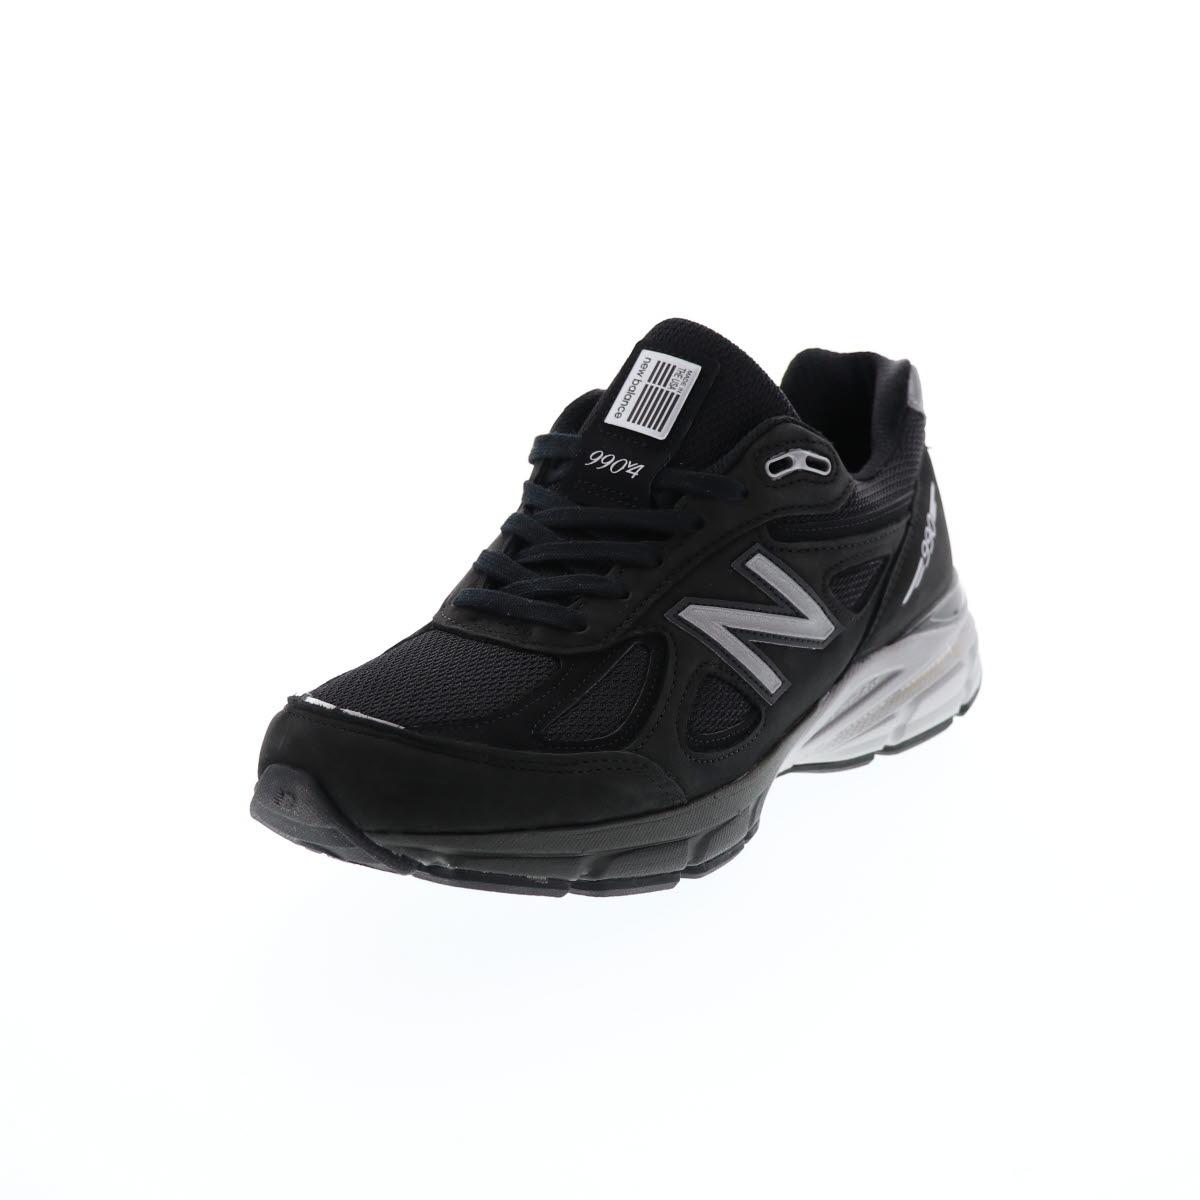 new balance ニューバランス メンズ スニーカー スエード 本革 M990 IB4 1023522 BLACK/SILVER ブラック×シルバー 黒M990 BL/SL